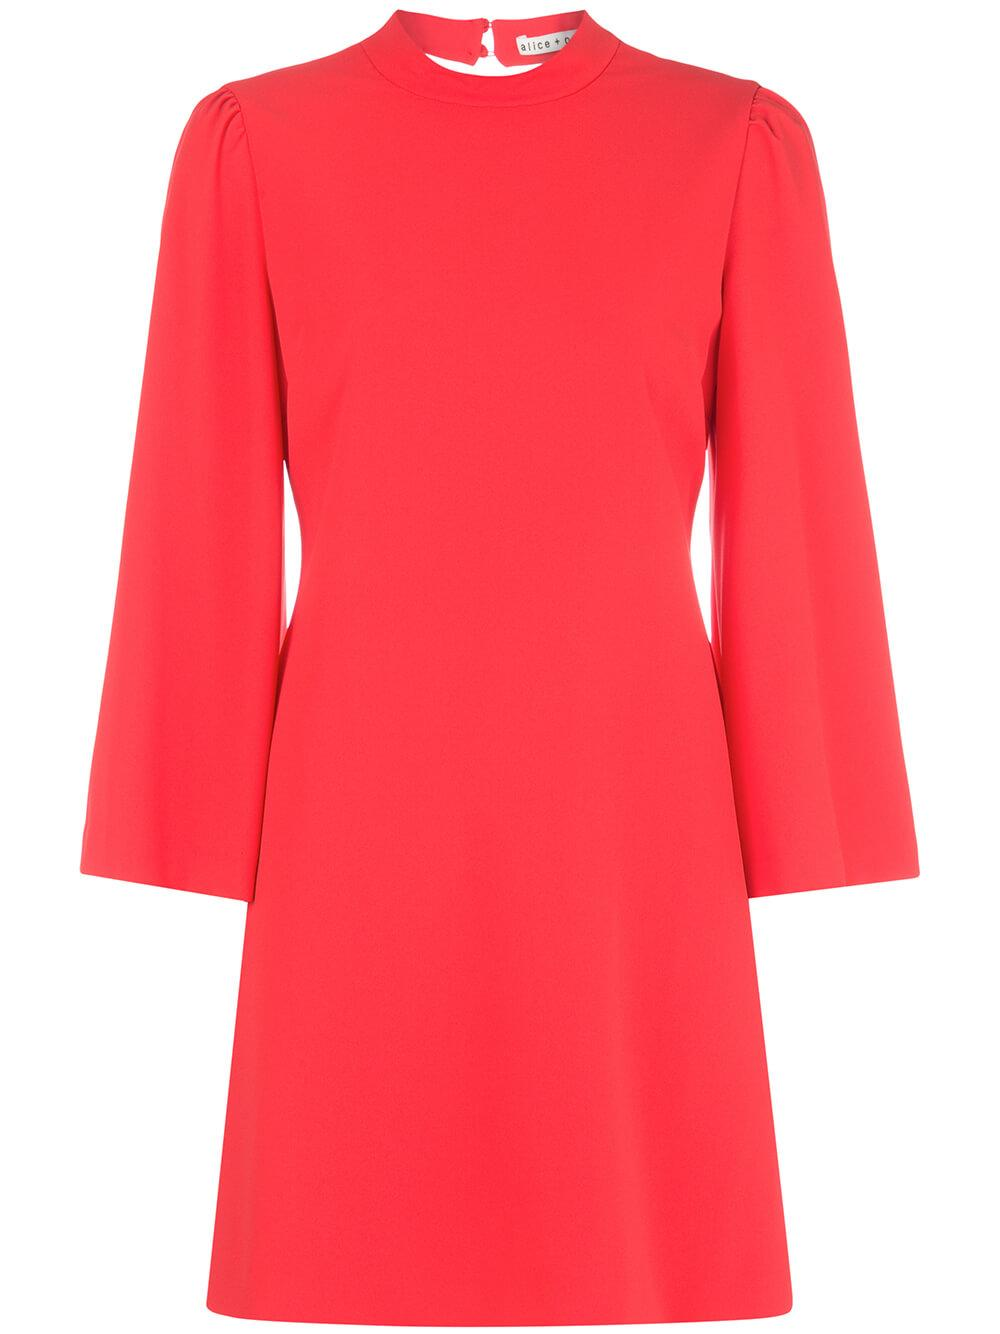 Bailey Bell Sleeve Open Back Dress Item # CC912202512